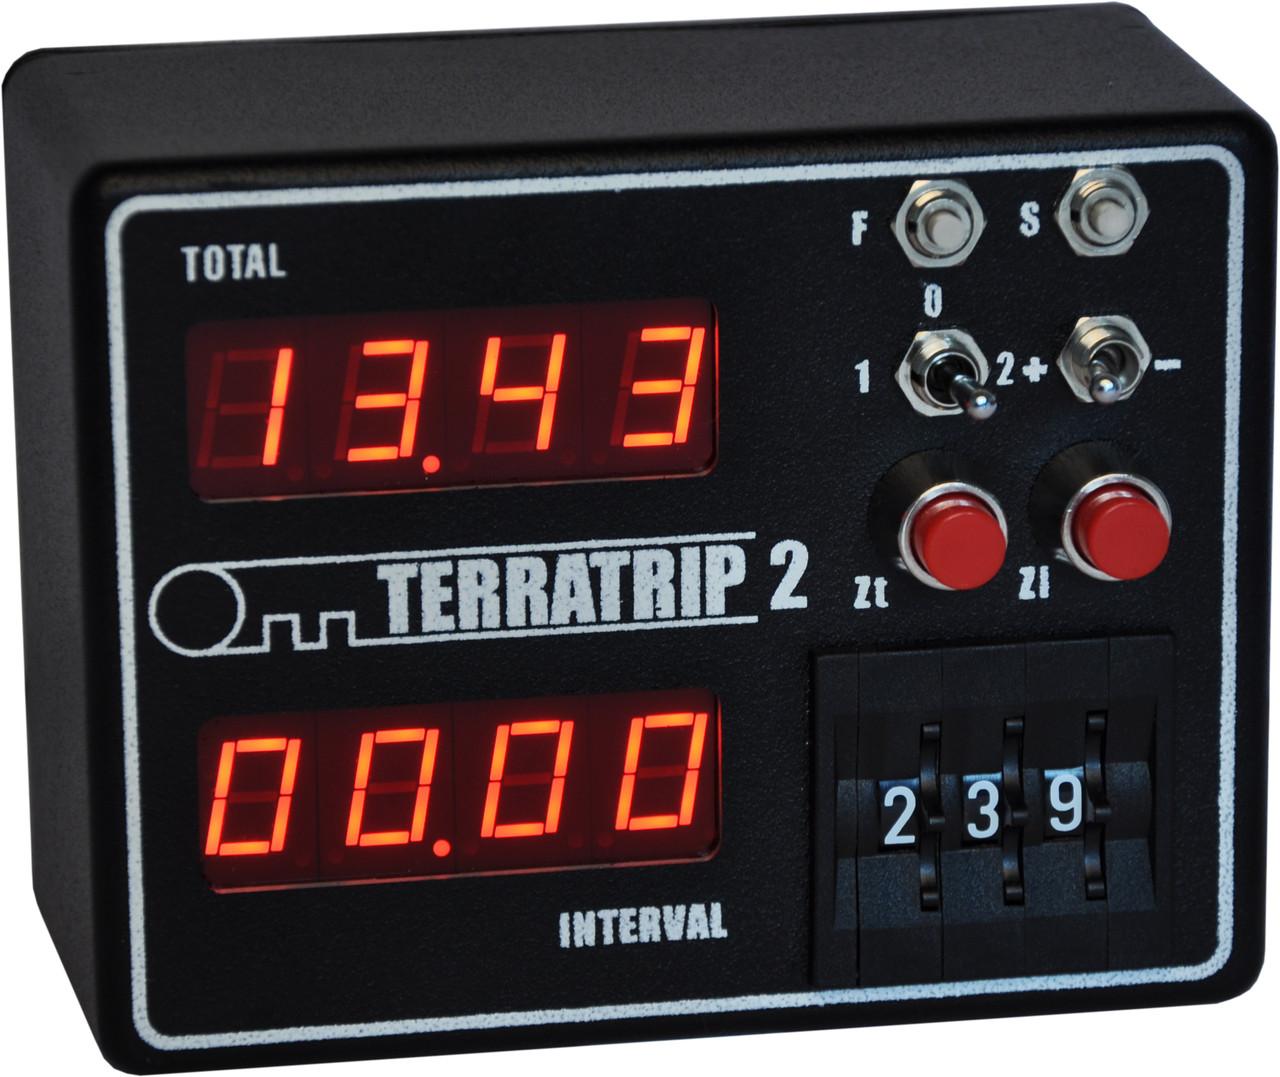 T002 Retro - Terratrip 2